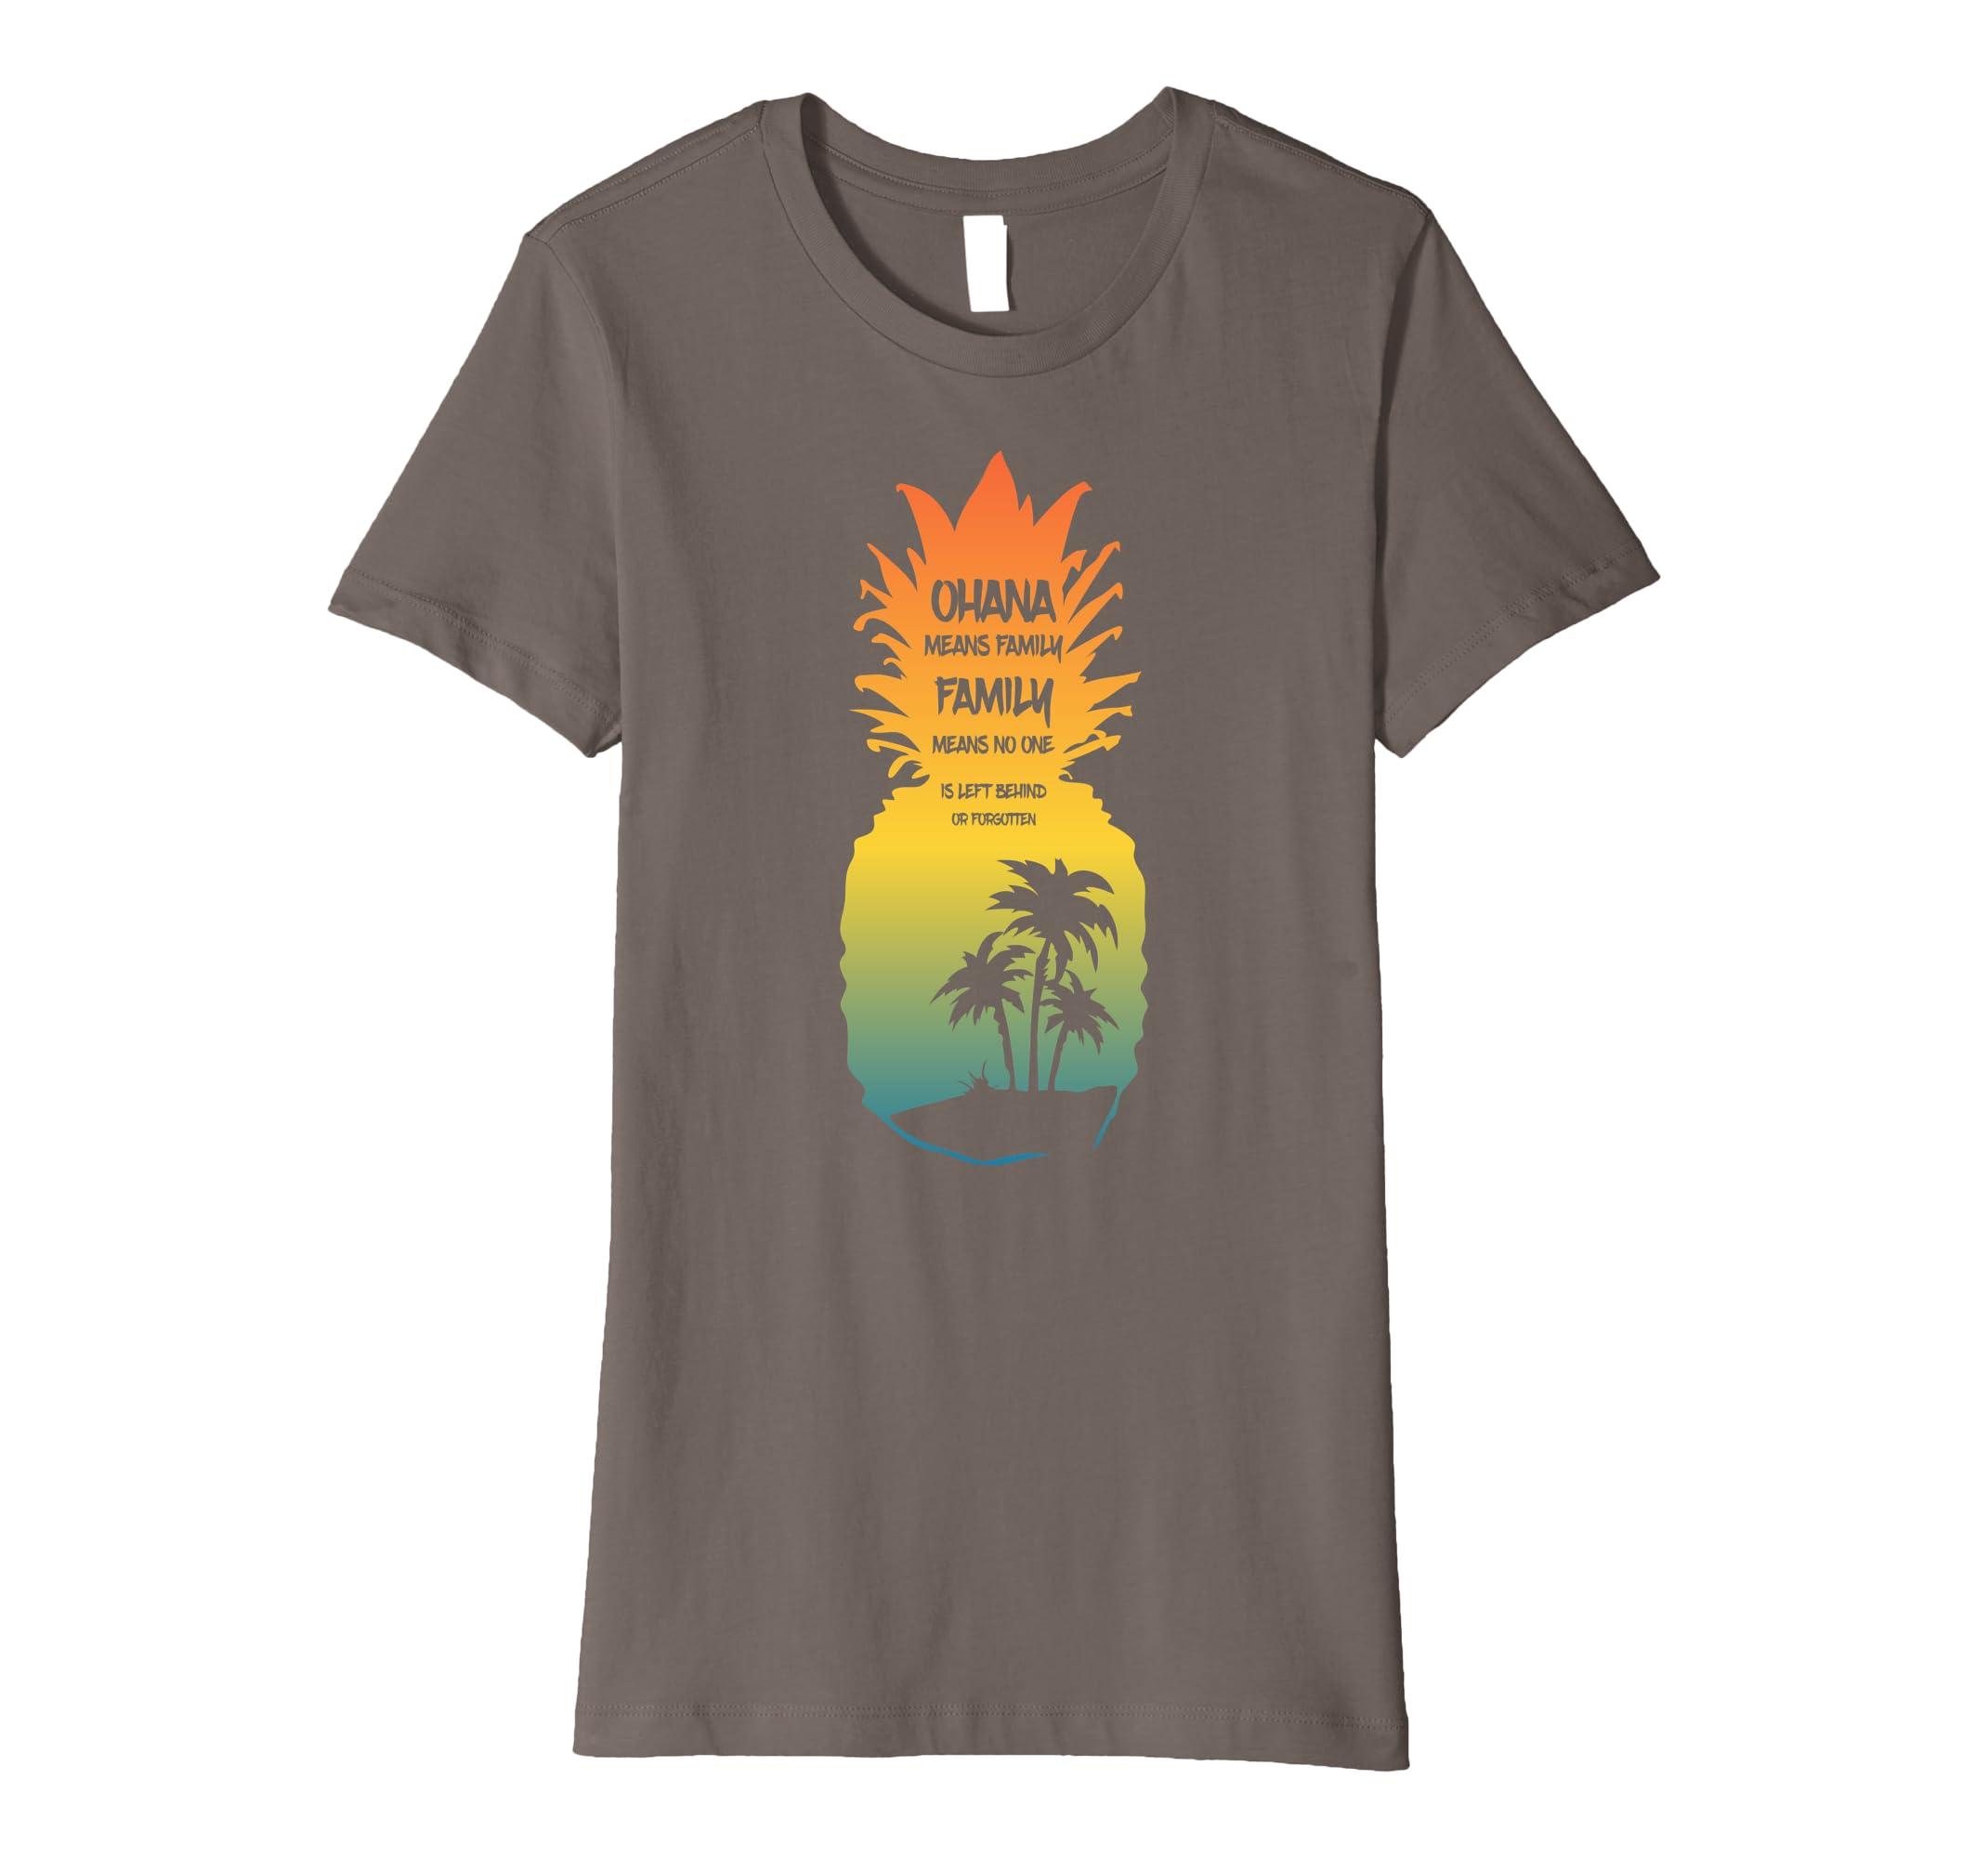 ad8fbf4a Amazon.com: Cute Ohana Means Family 2018 T-Shirt: Clothing